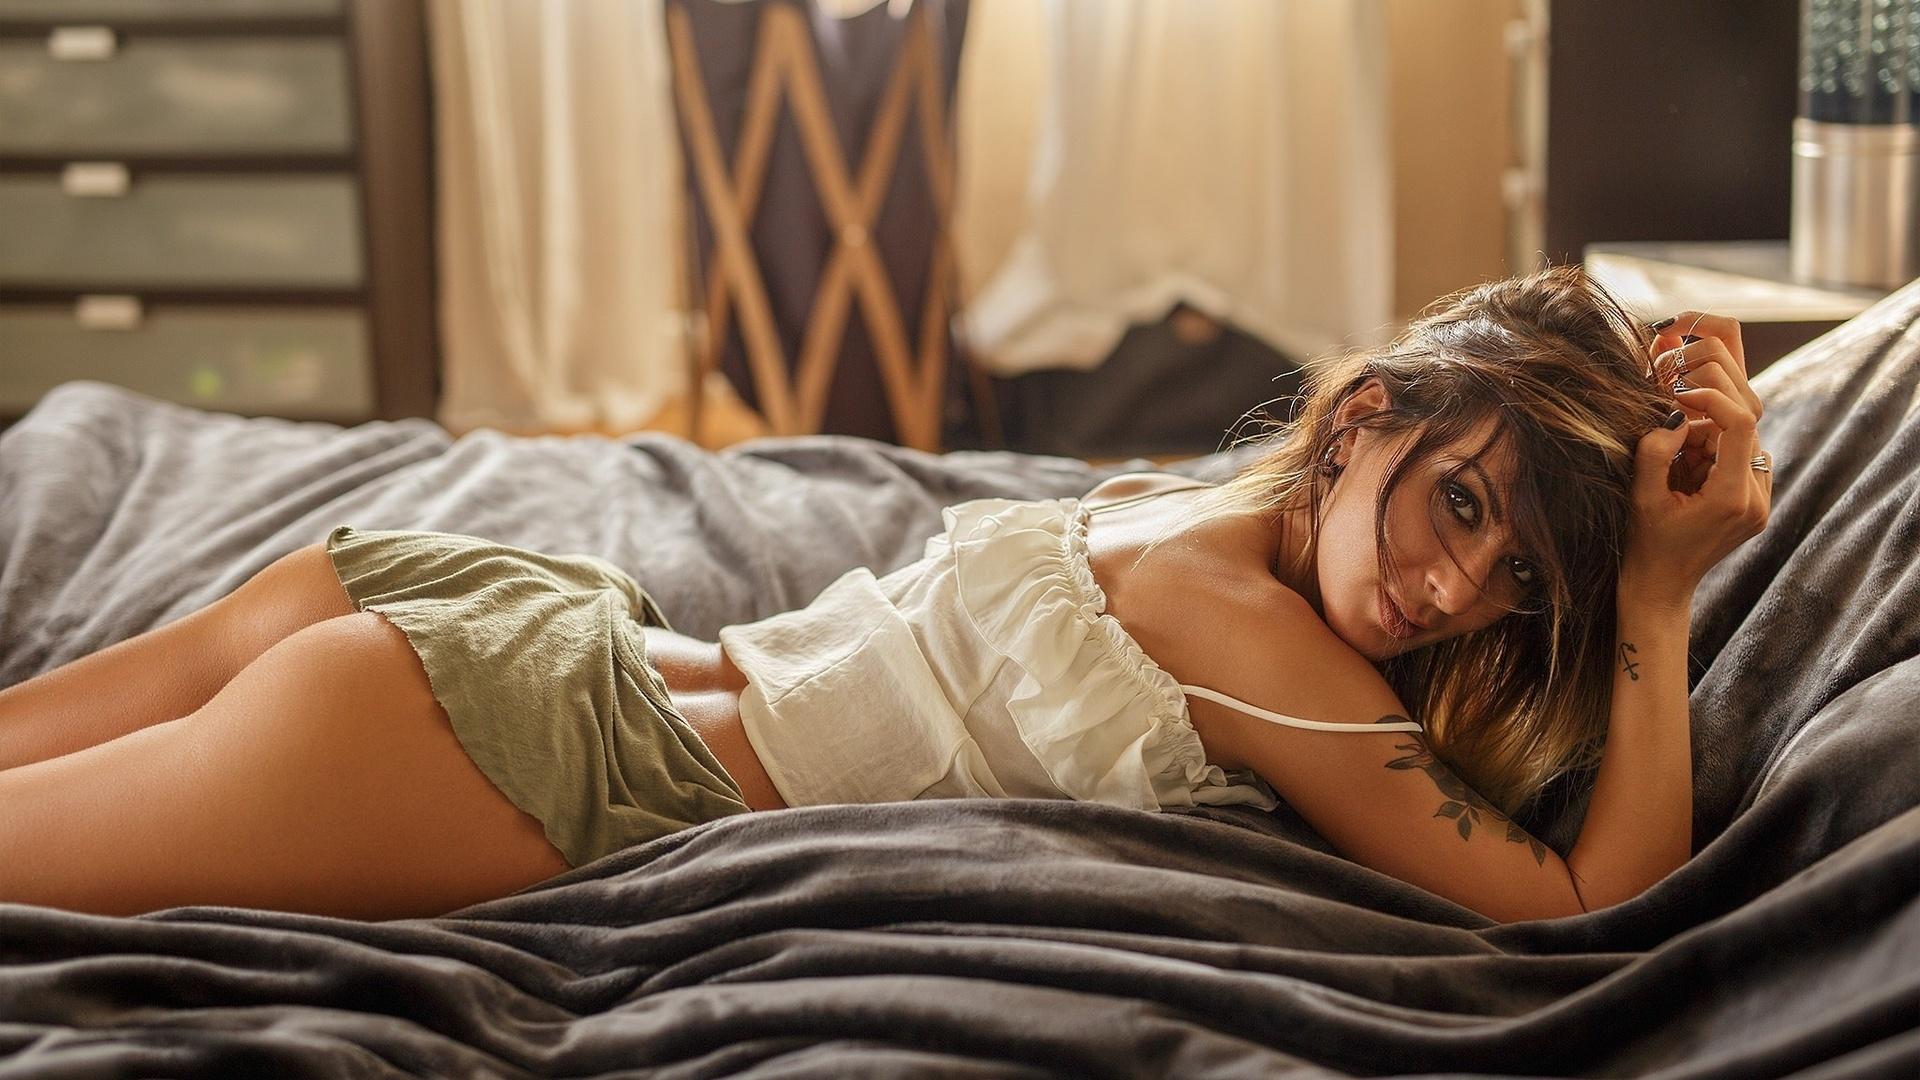 мокрые девушки на кровати нашем